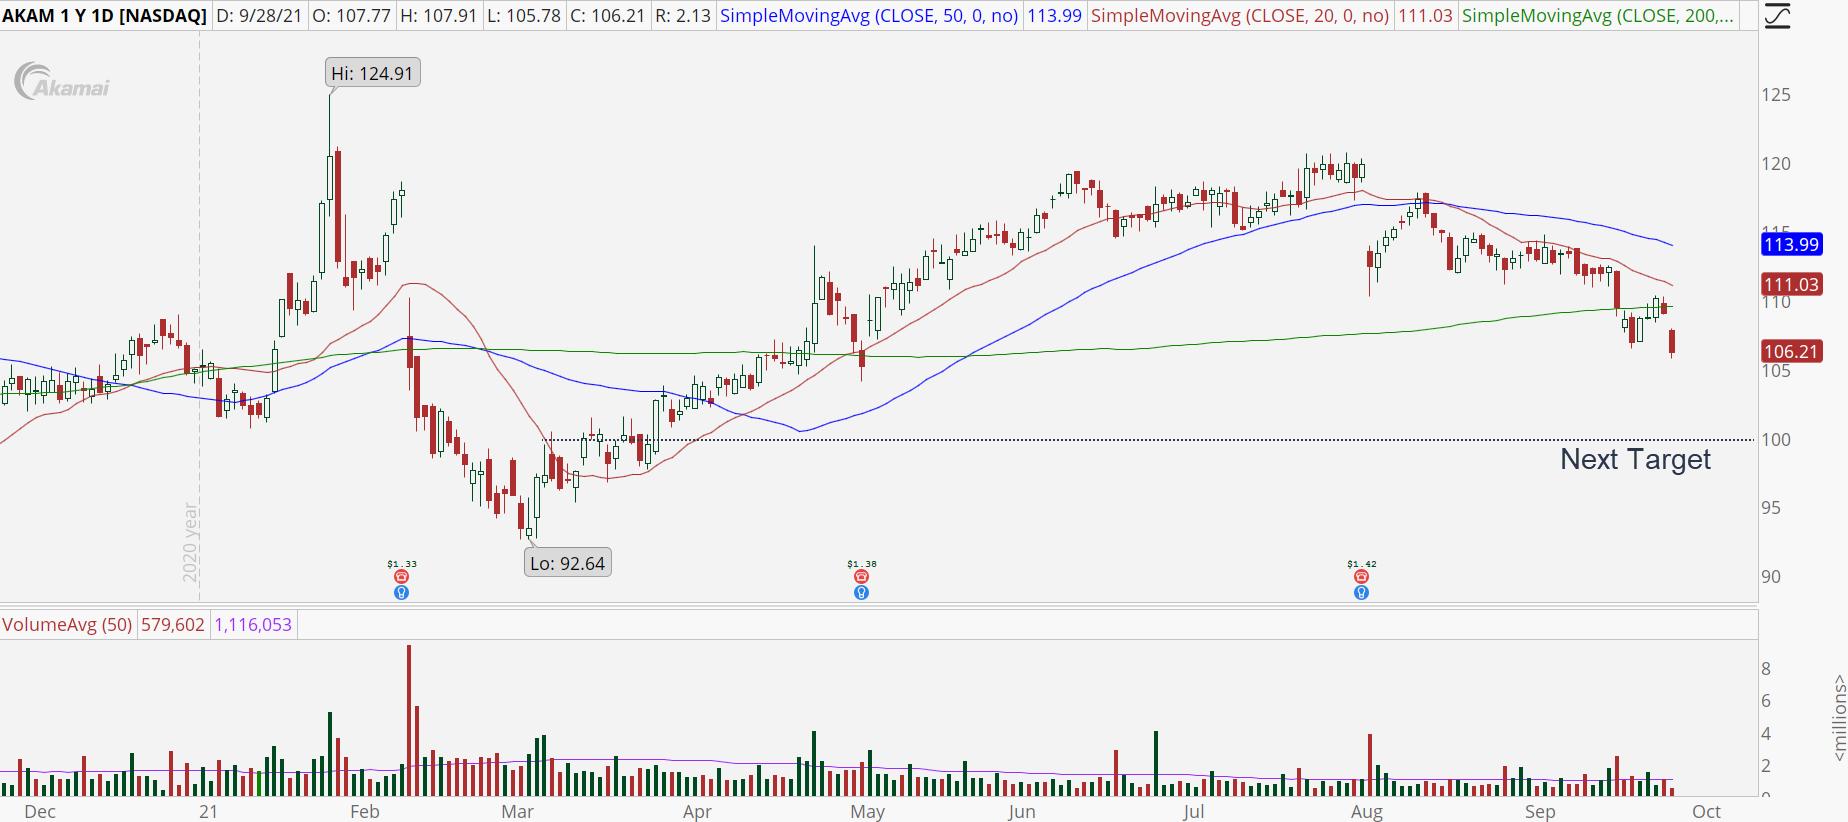 Akamai (AKAM) stock chart with bearish breakout